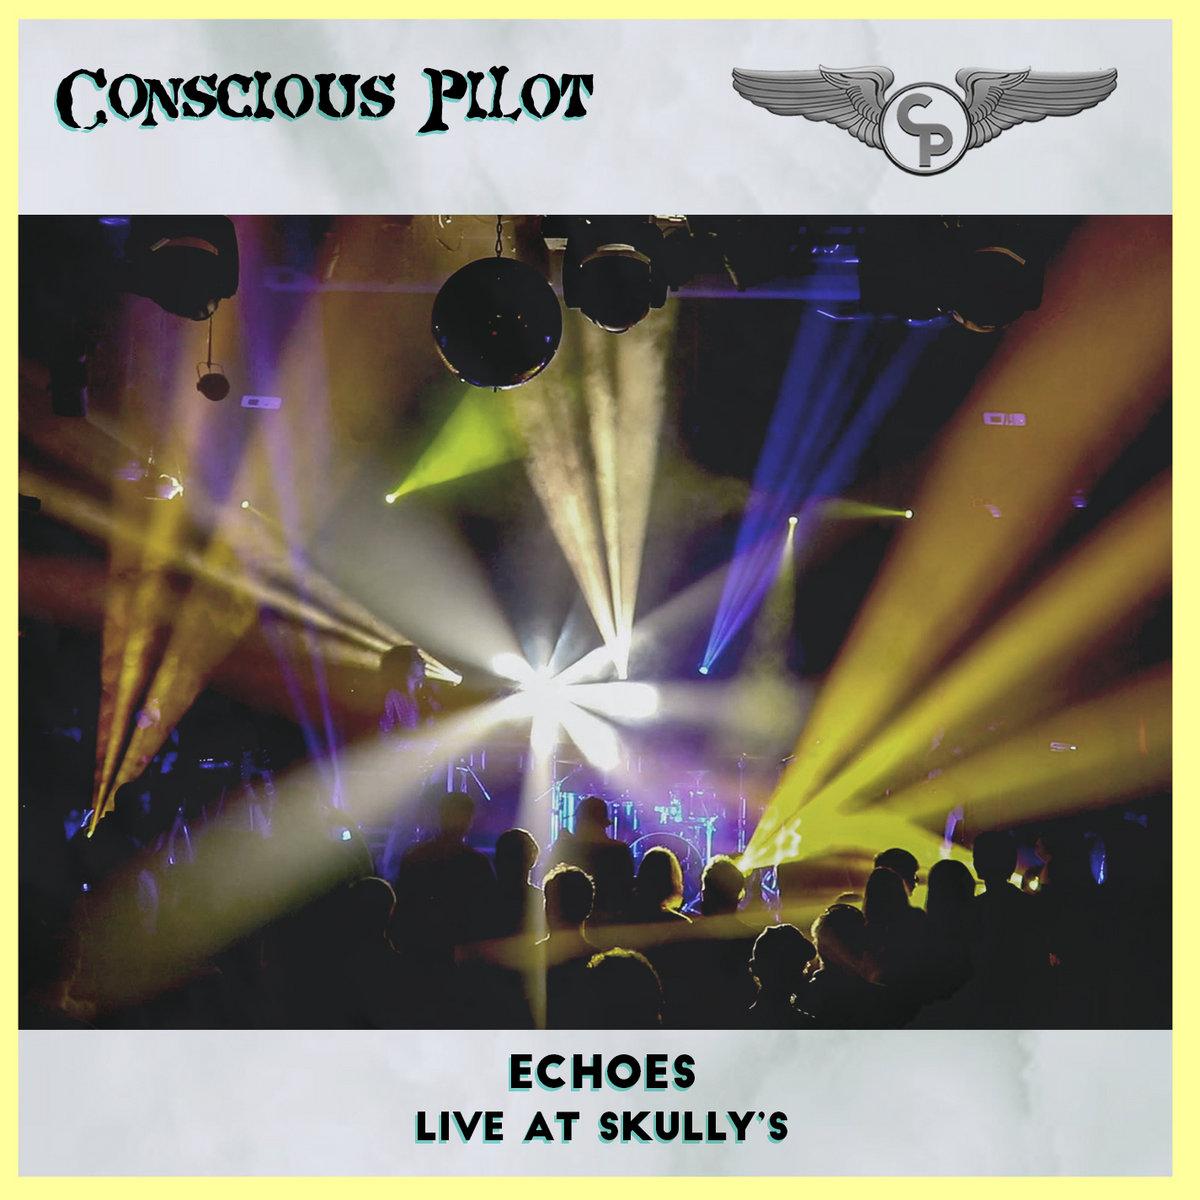 Echoes (Pink Floyd) | Conscious Pilot